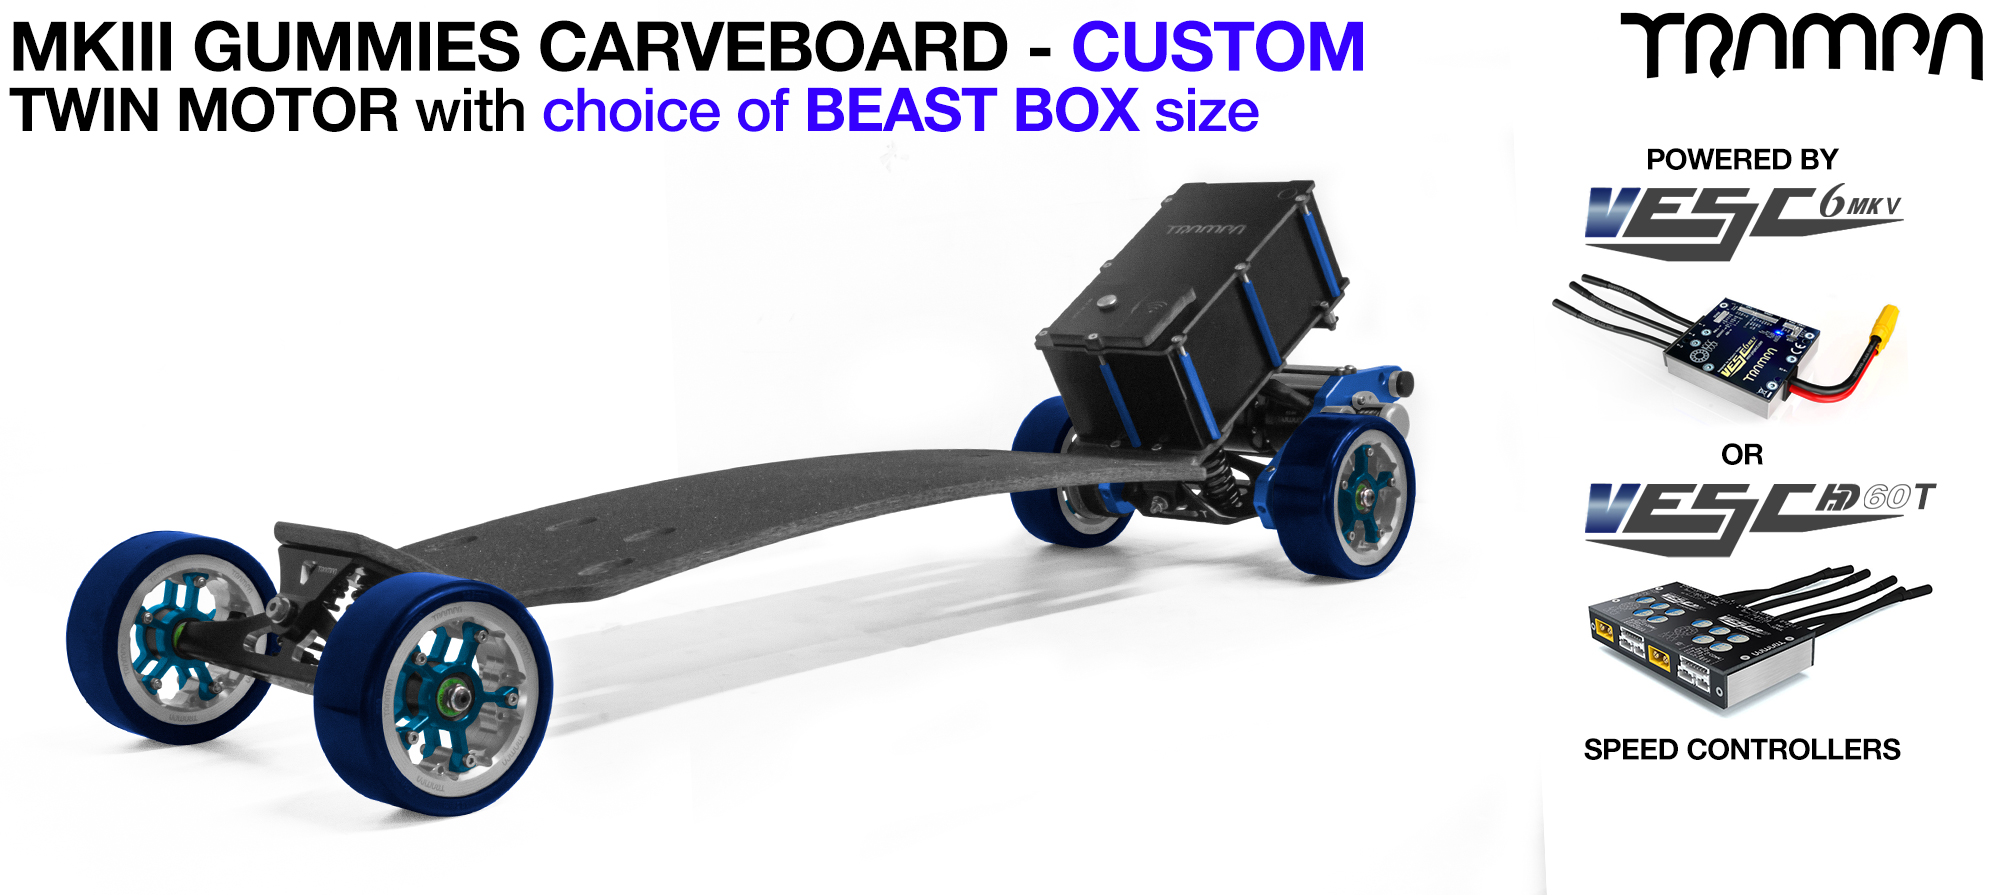 TRAMPA's MkIII Electric GUMMIES Carveboard - uses Mini Spring Trucks with MkIII Carve board Motor Mount,s Custom TRAMPA hubs & 125mm GUMMIES longboard Tyres - TWIN Motor CUSTOM